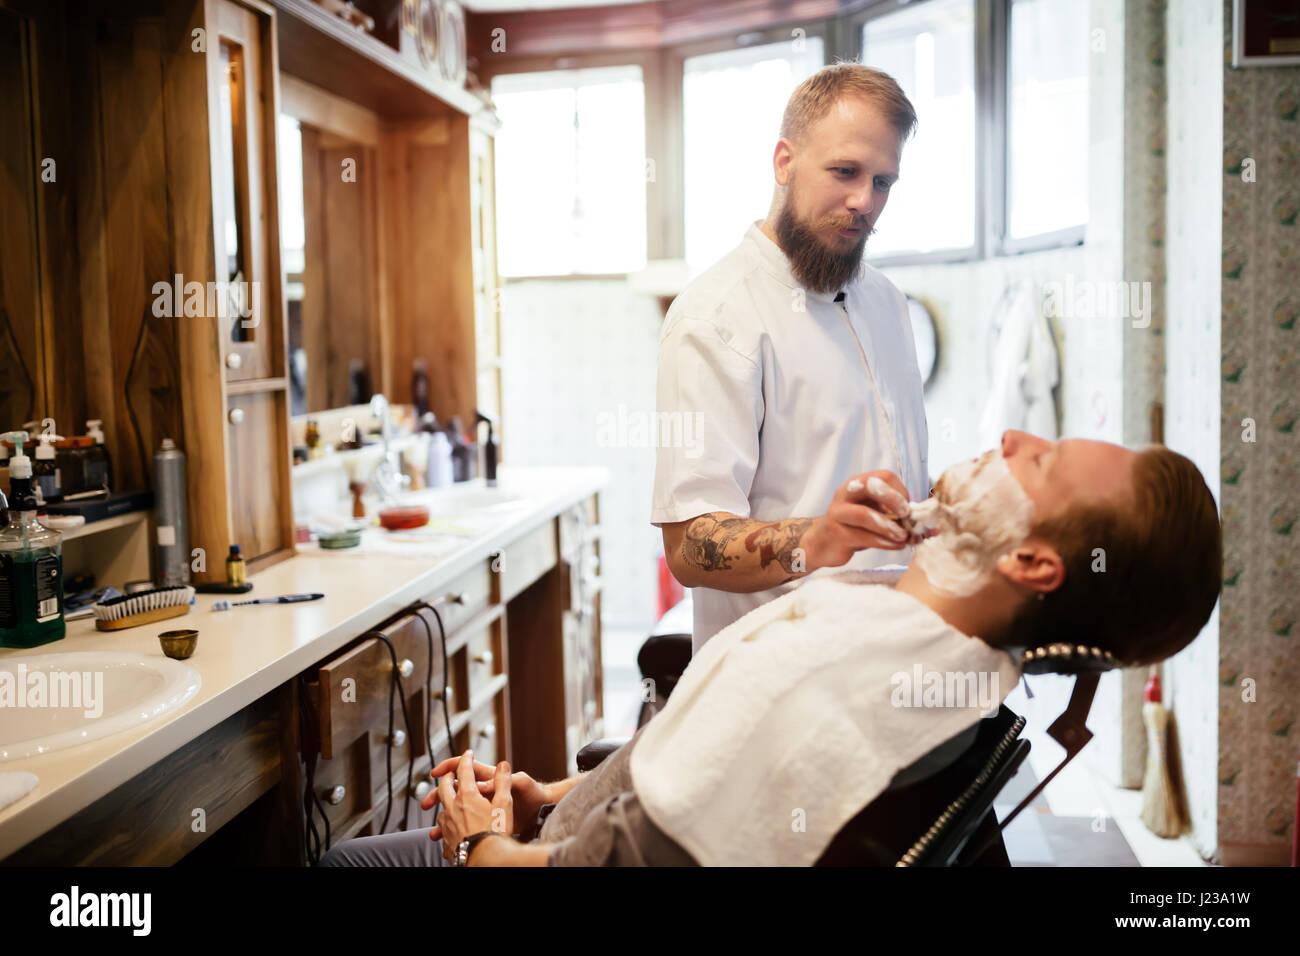 barber shaving grooming men in stock photos barber shaving grooming men in stock images alamy. Black Bedroom Furniture Sets. Home Design Ideas